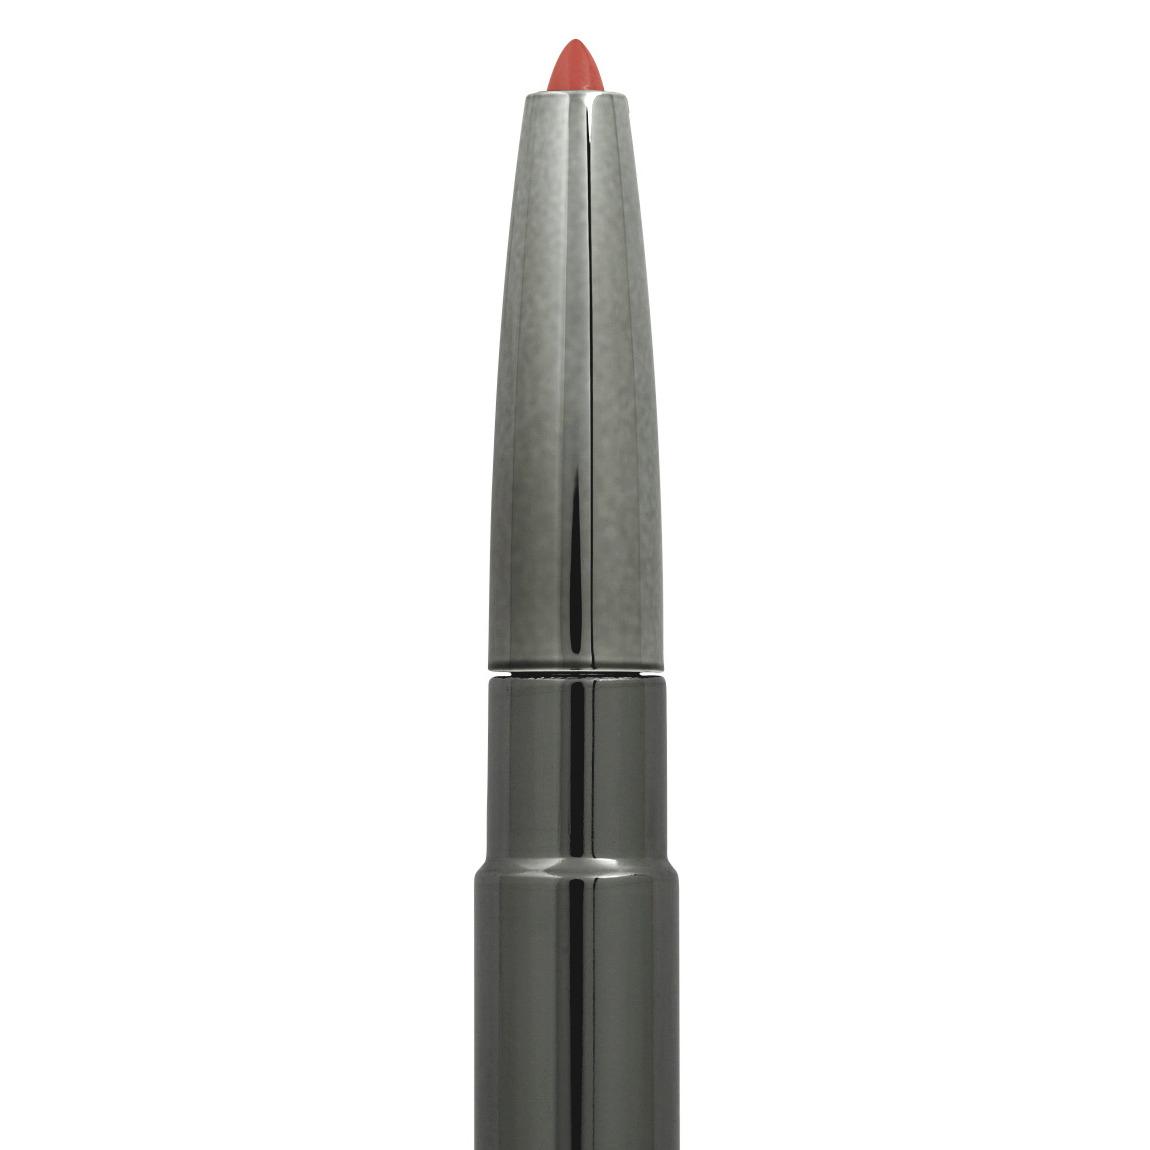 Inglot Cosmetics Full Metal Lipliner 851 alternative view 1.